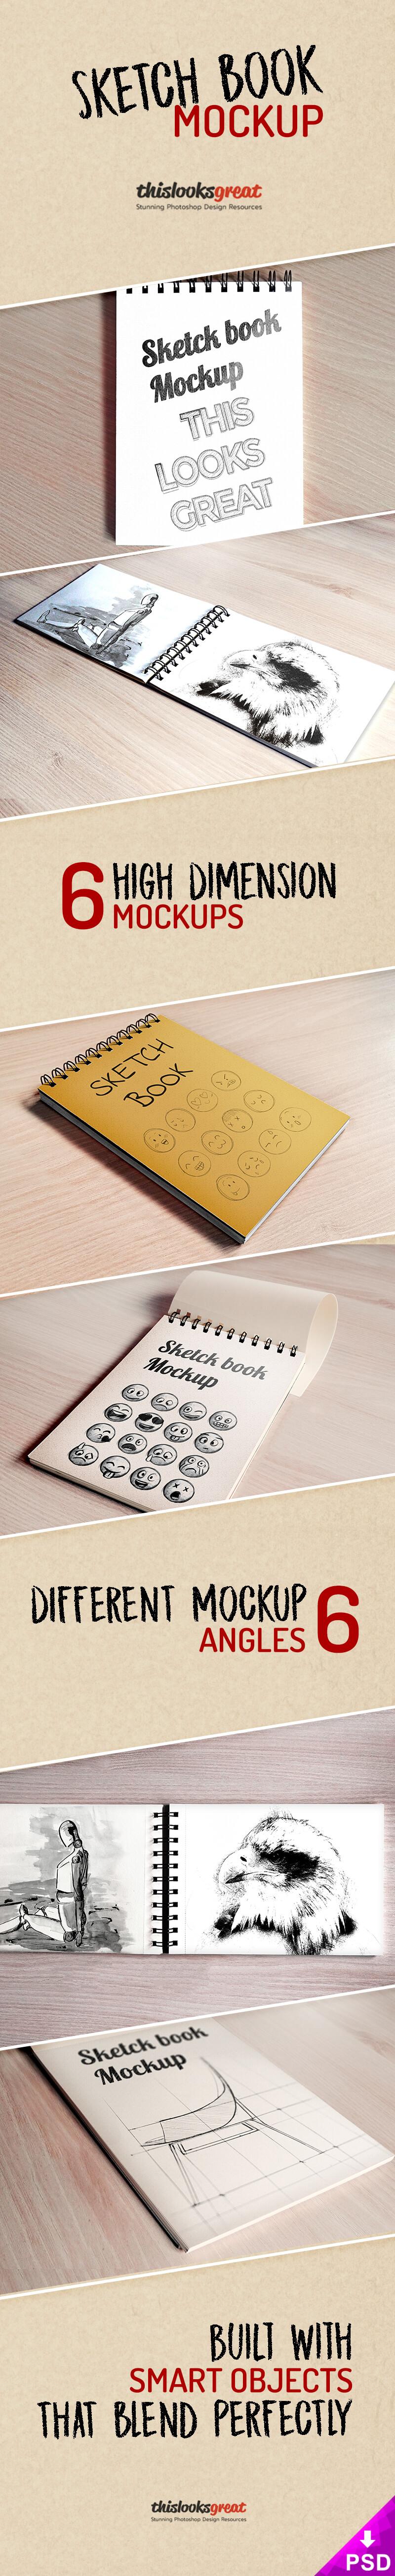 Sketch Book Mockup